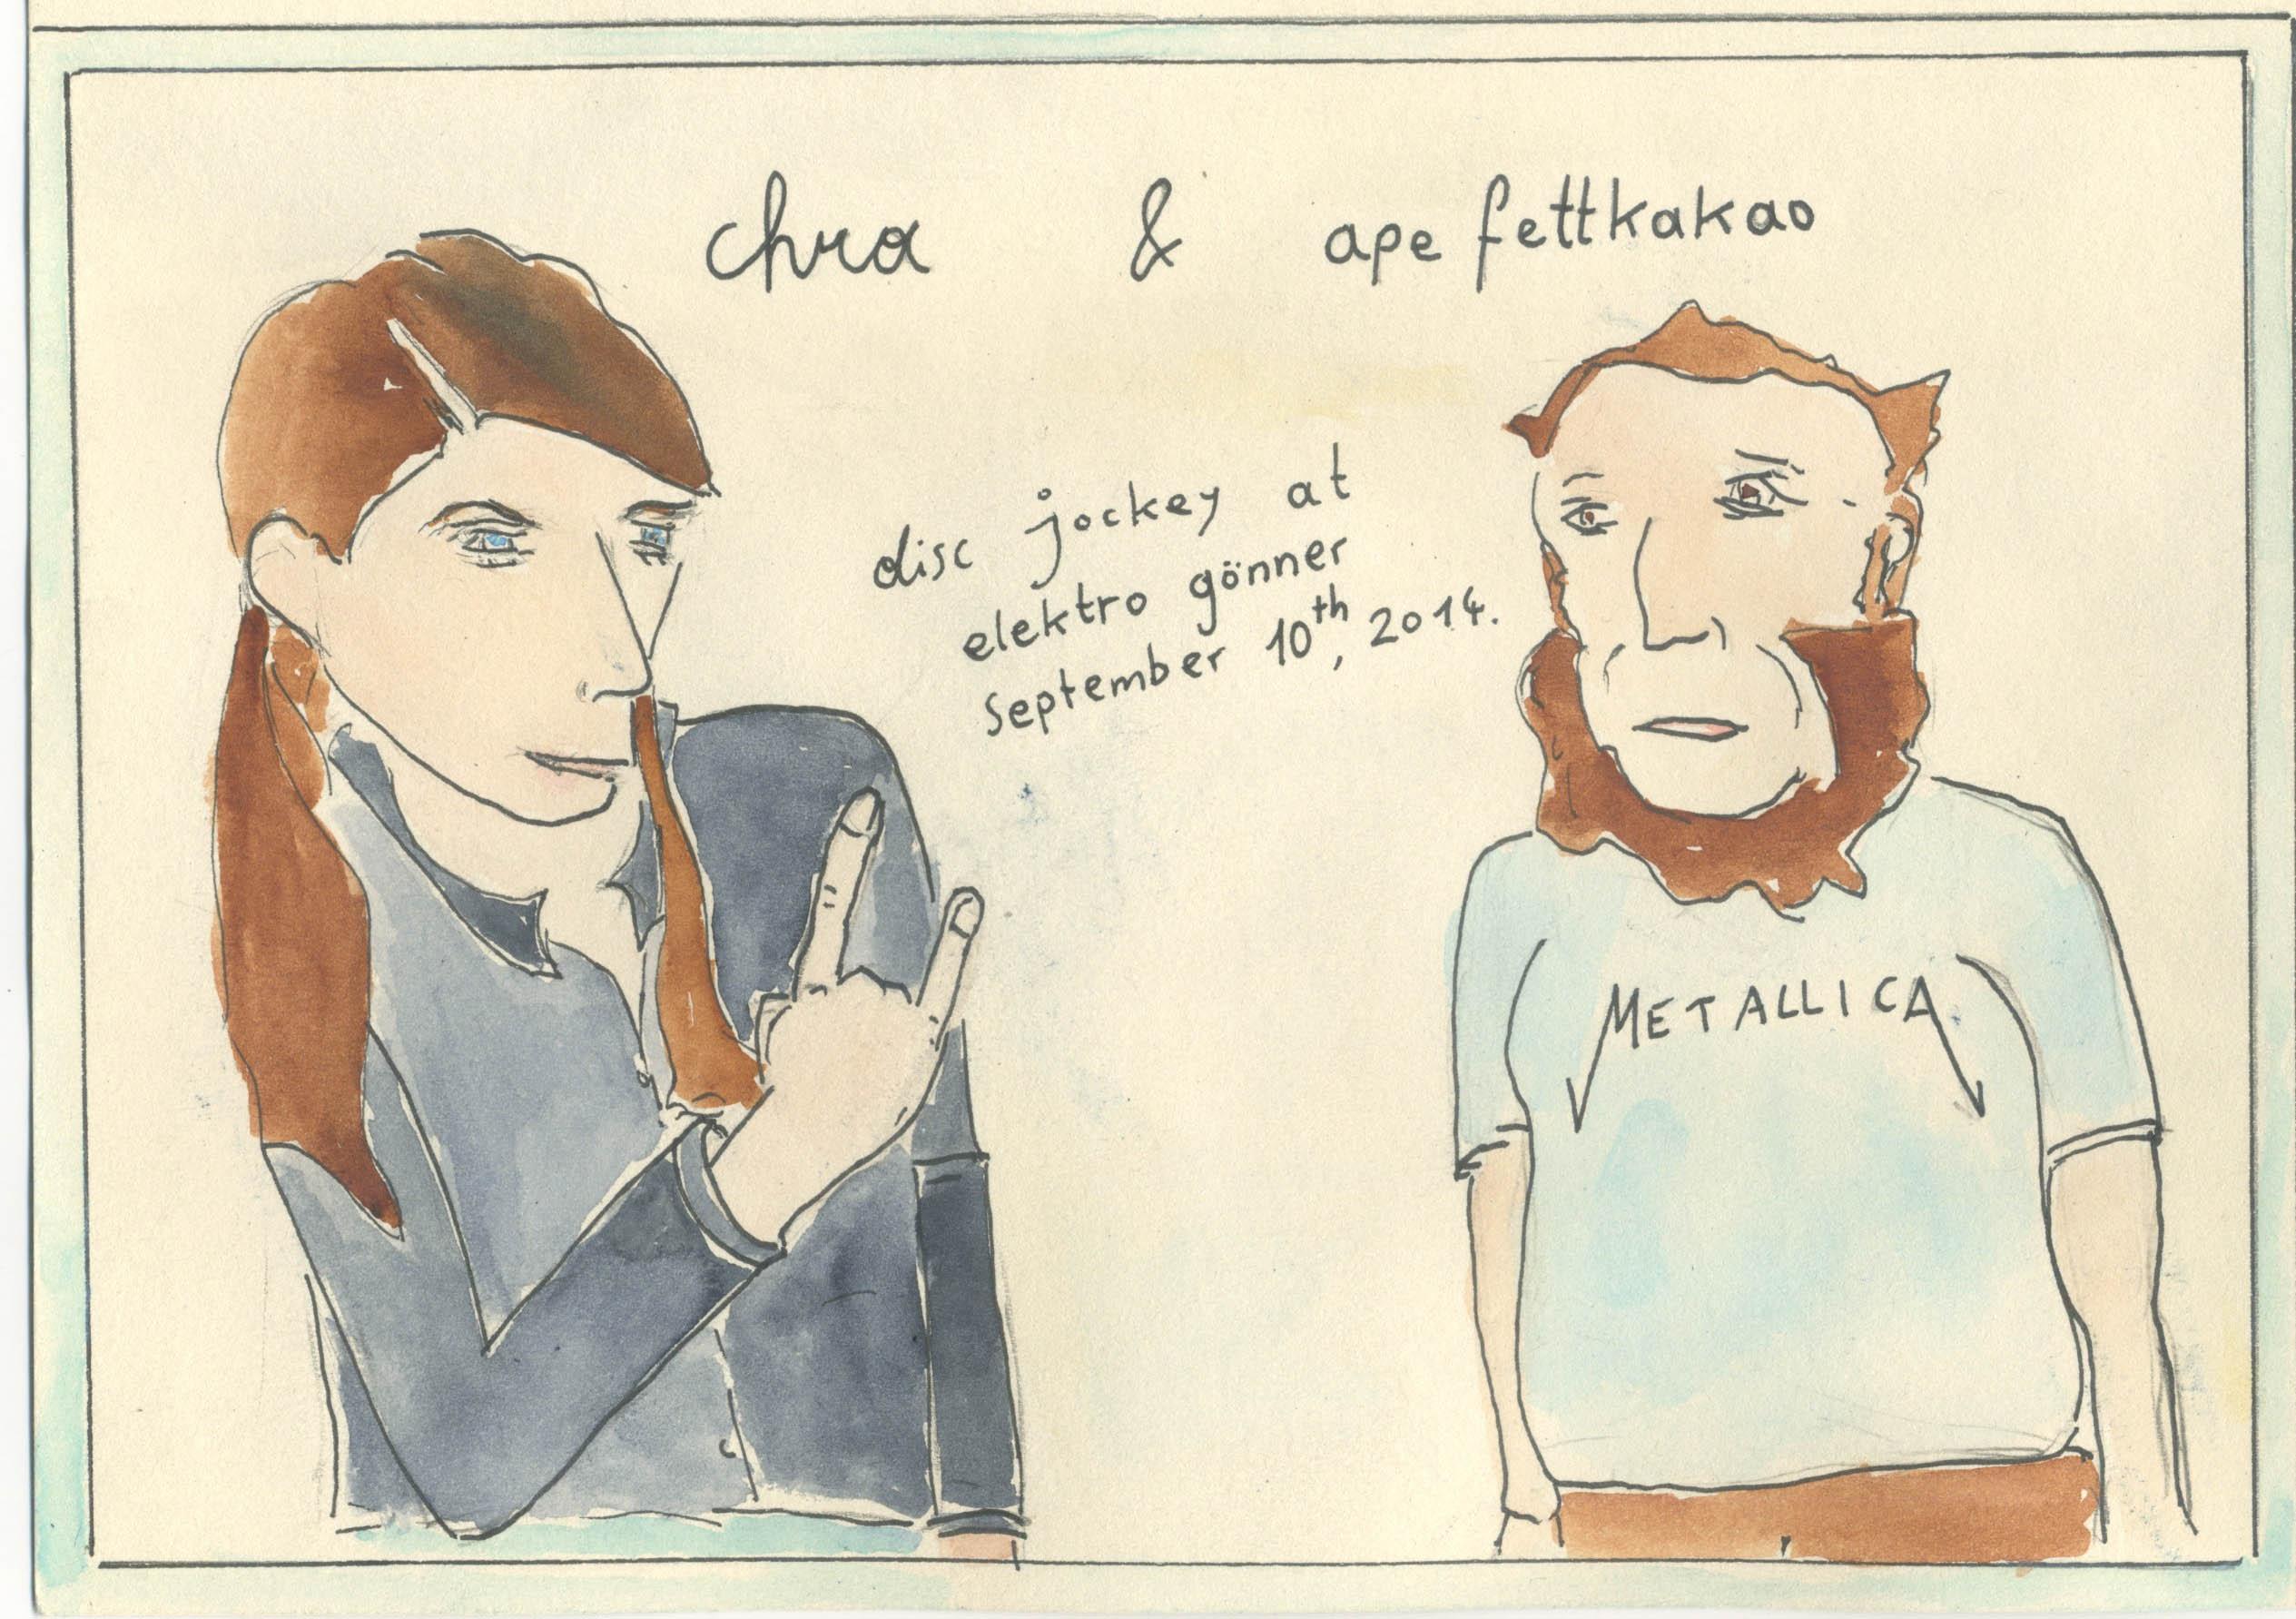 Chra & Ape Fettkakao